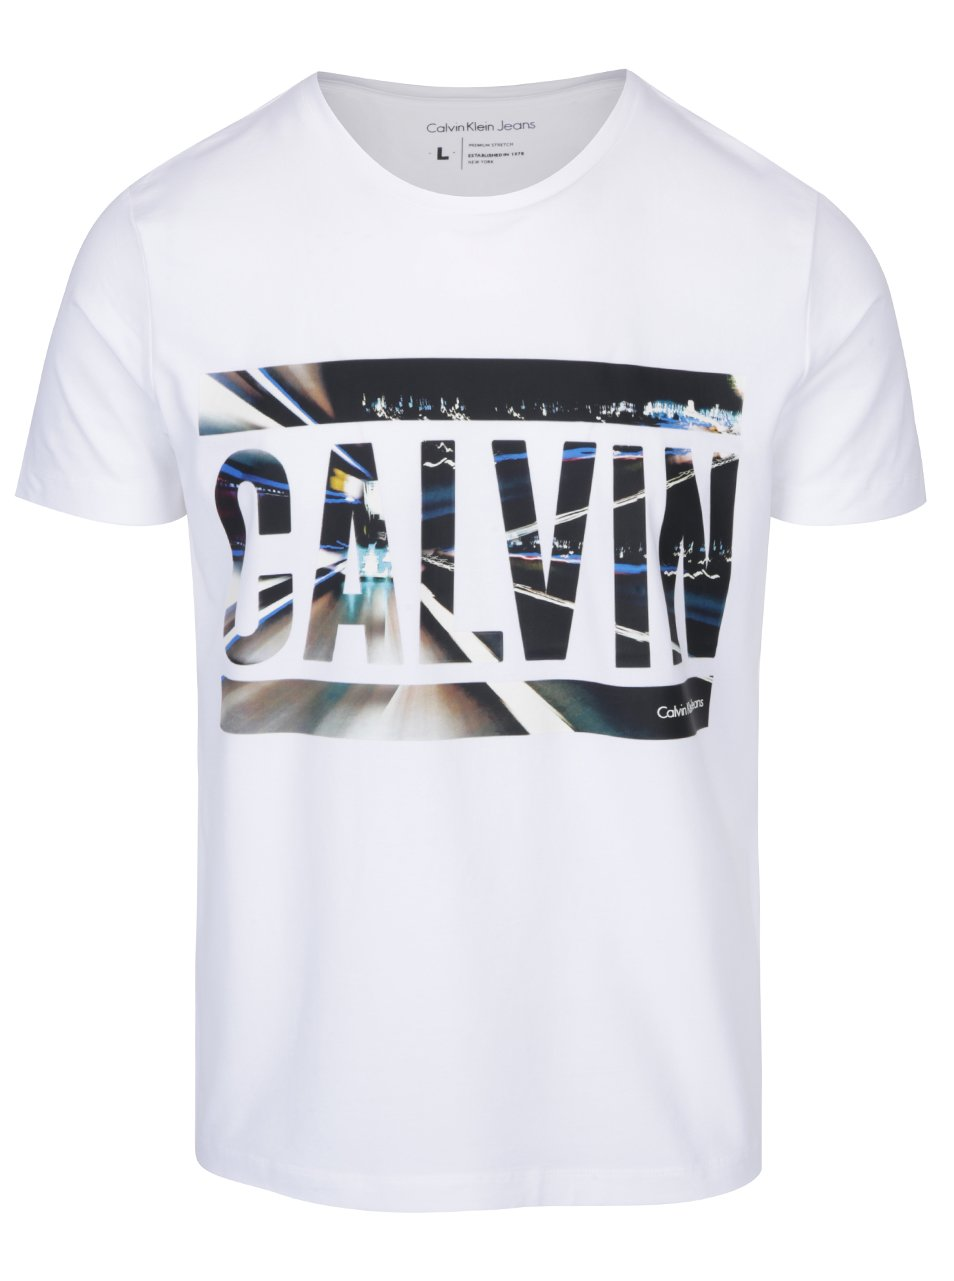 Bílé pánské tričko s barevným potiskem Calvin Klein Jeans Tonus